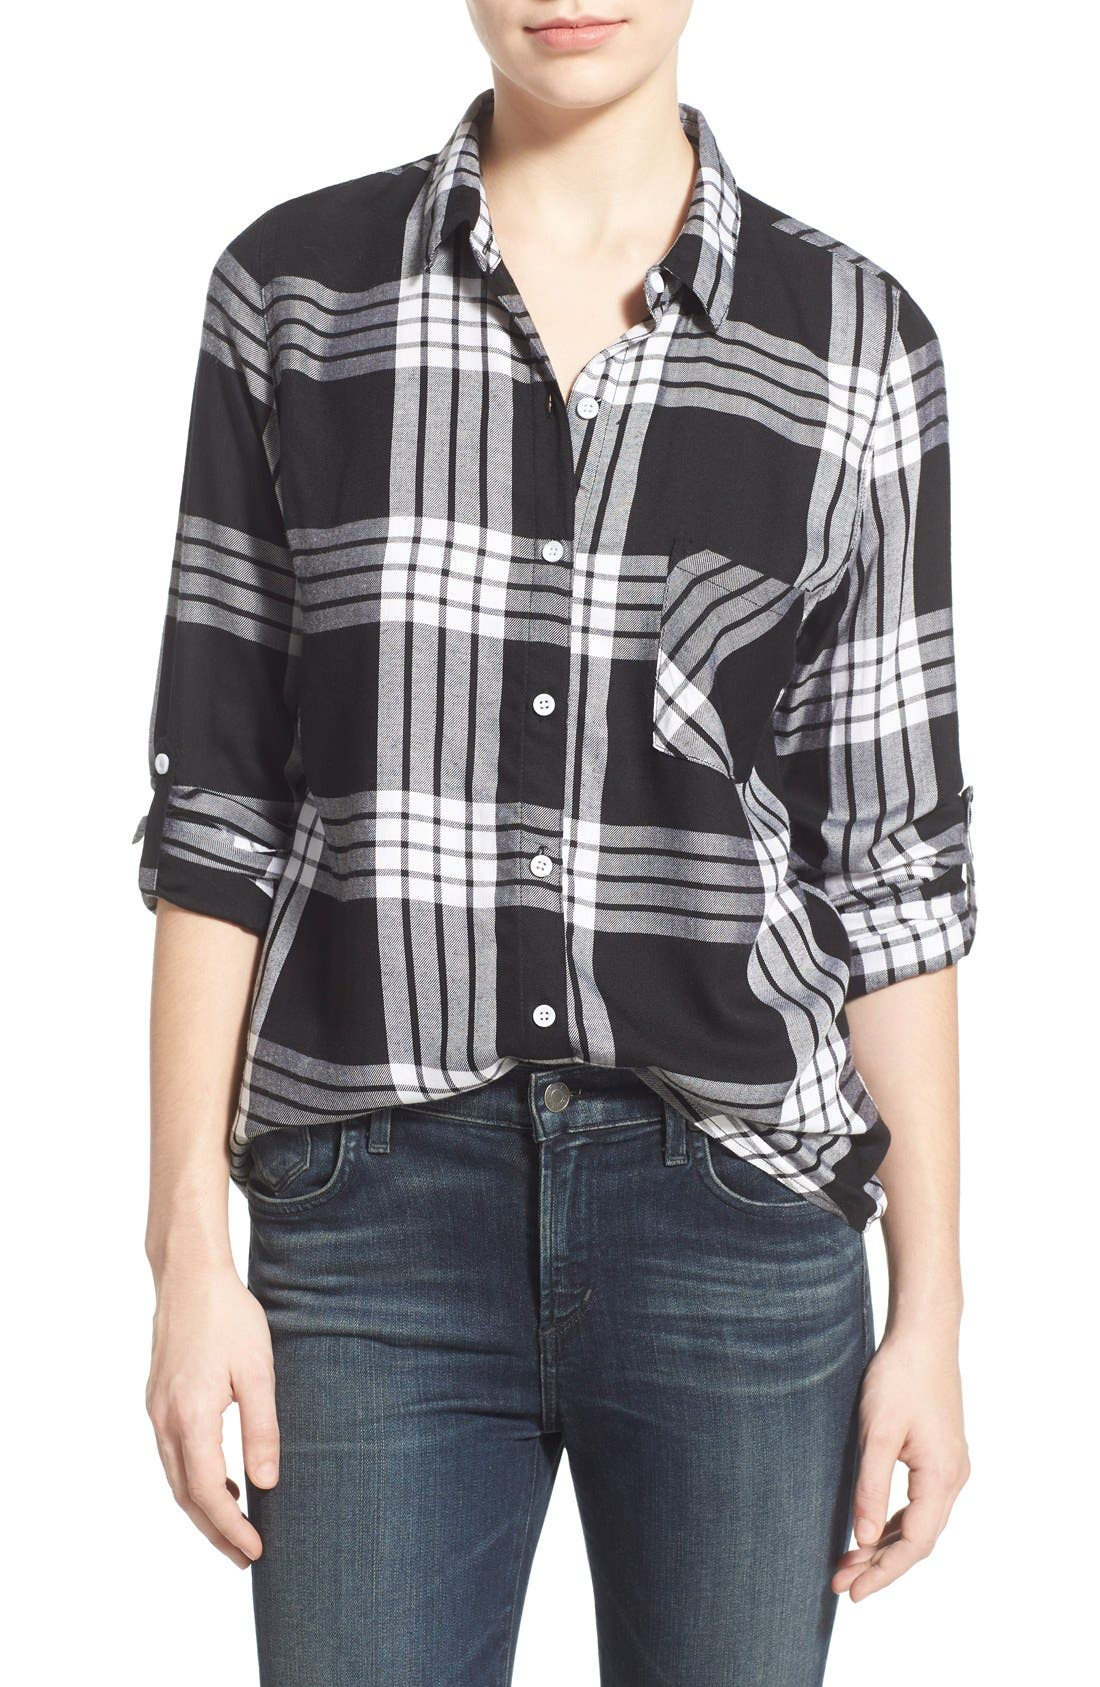 Main Image - Thread & Supply 'Denver' Plaid Shirt